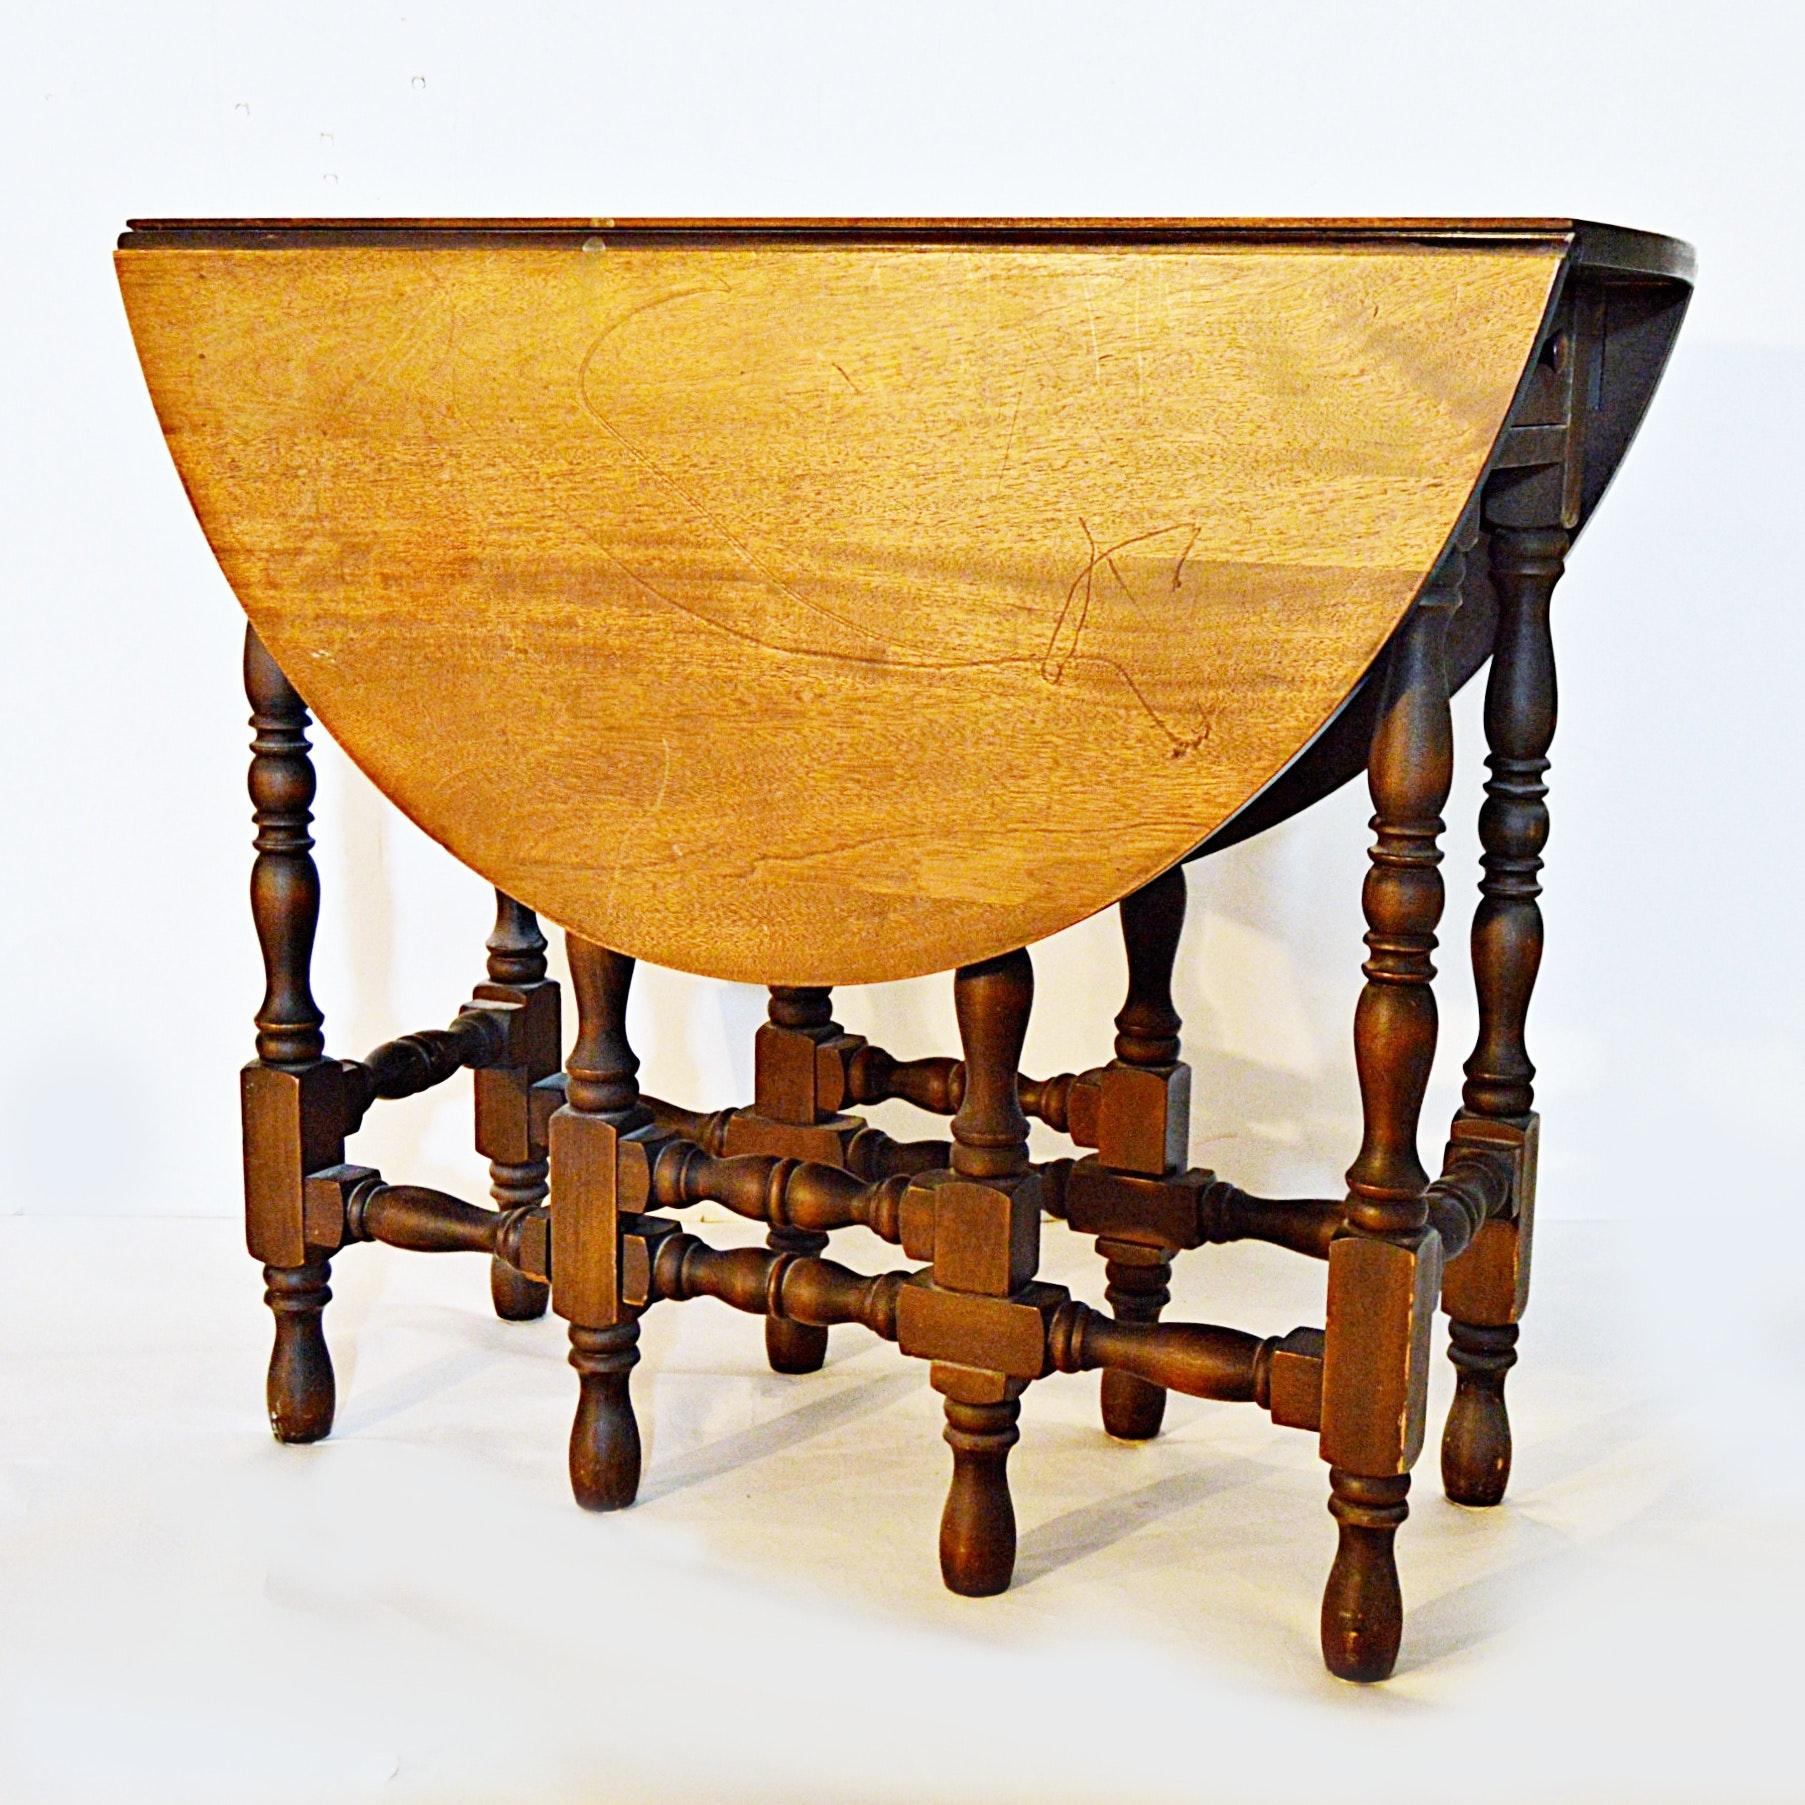 Vintage William and Mary Style Mahogany Gateleg Table